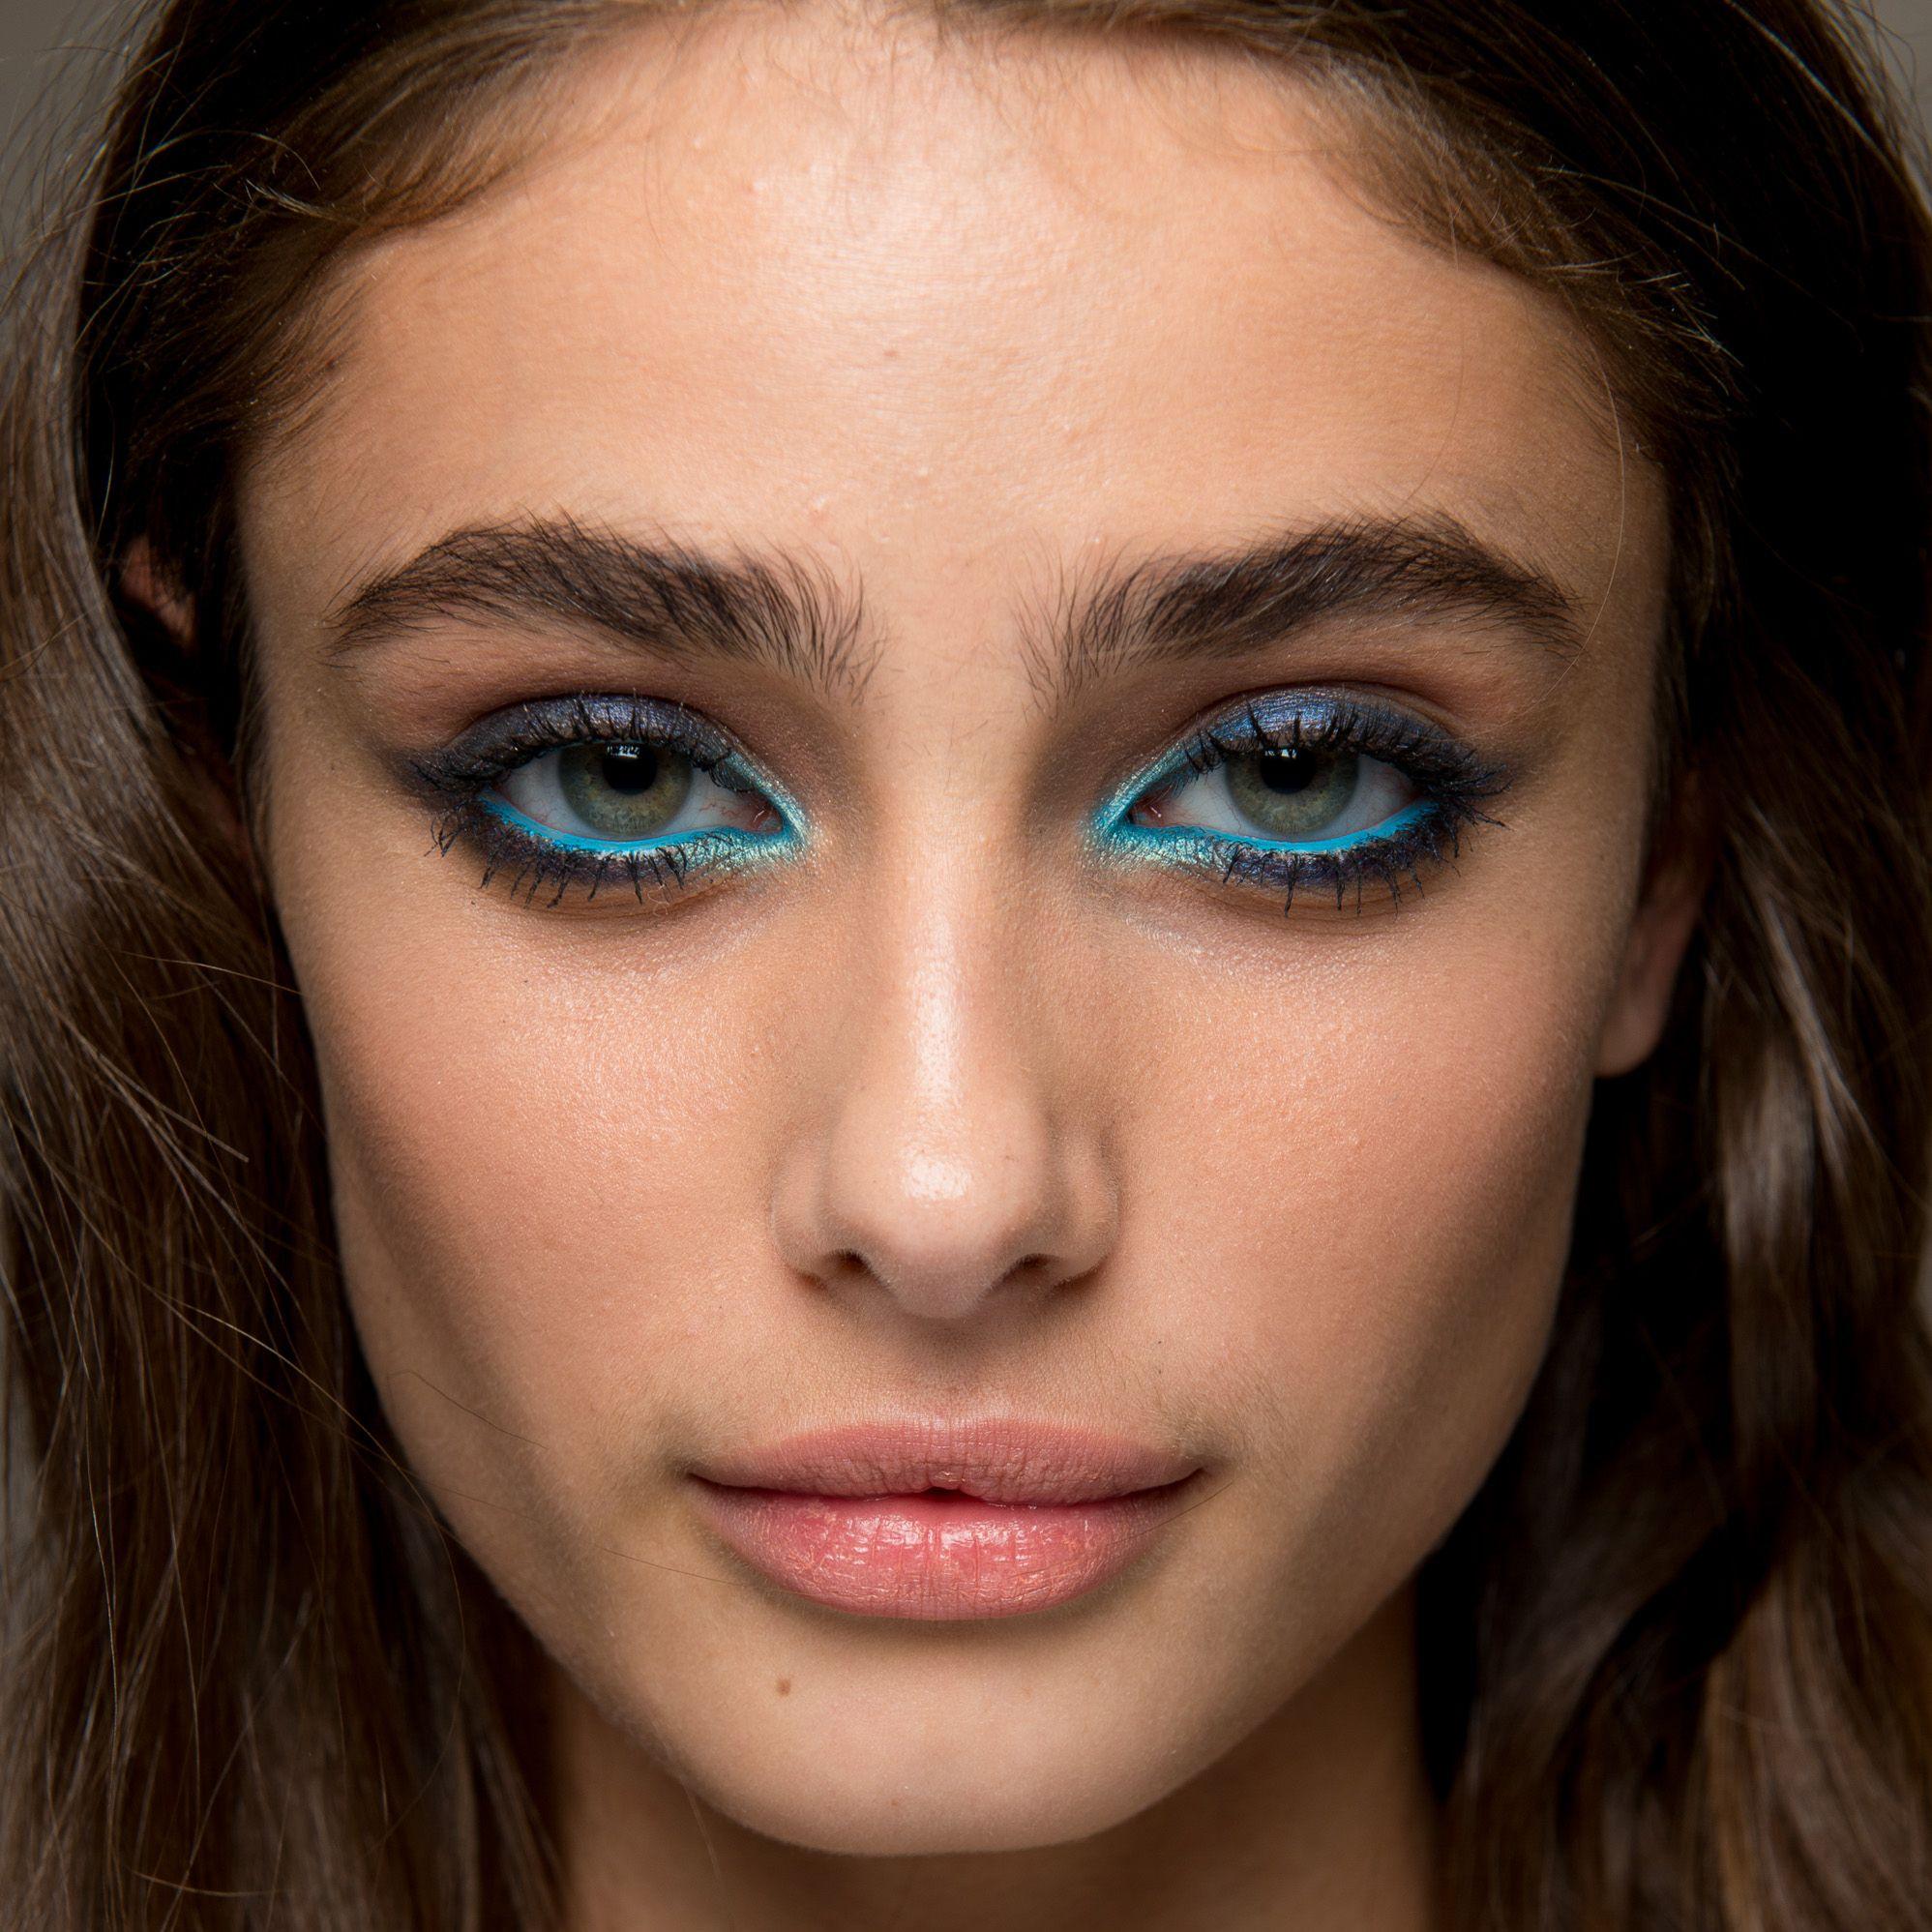 Elie Saab Spring/Summer 2015 beauty trends - Paris Fashion Week